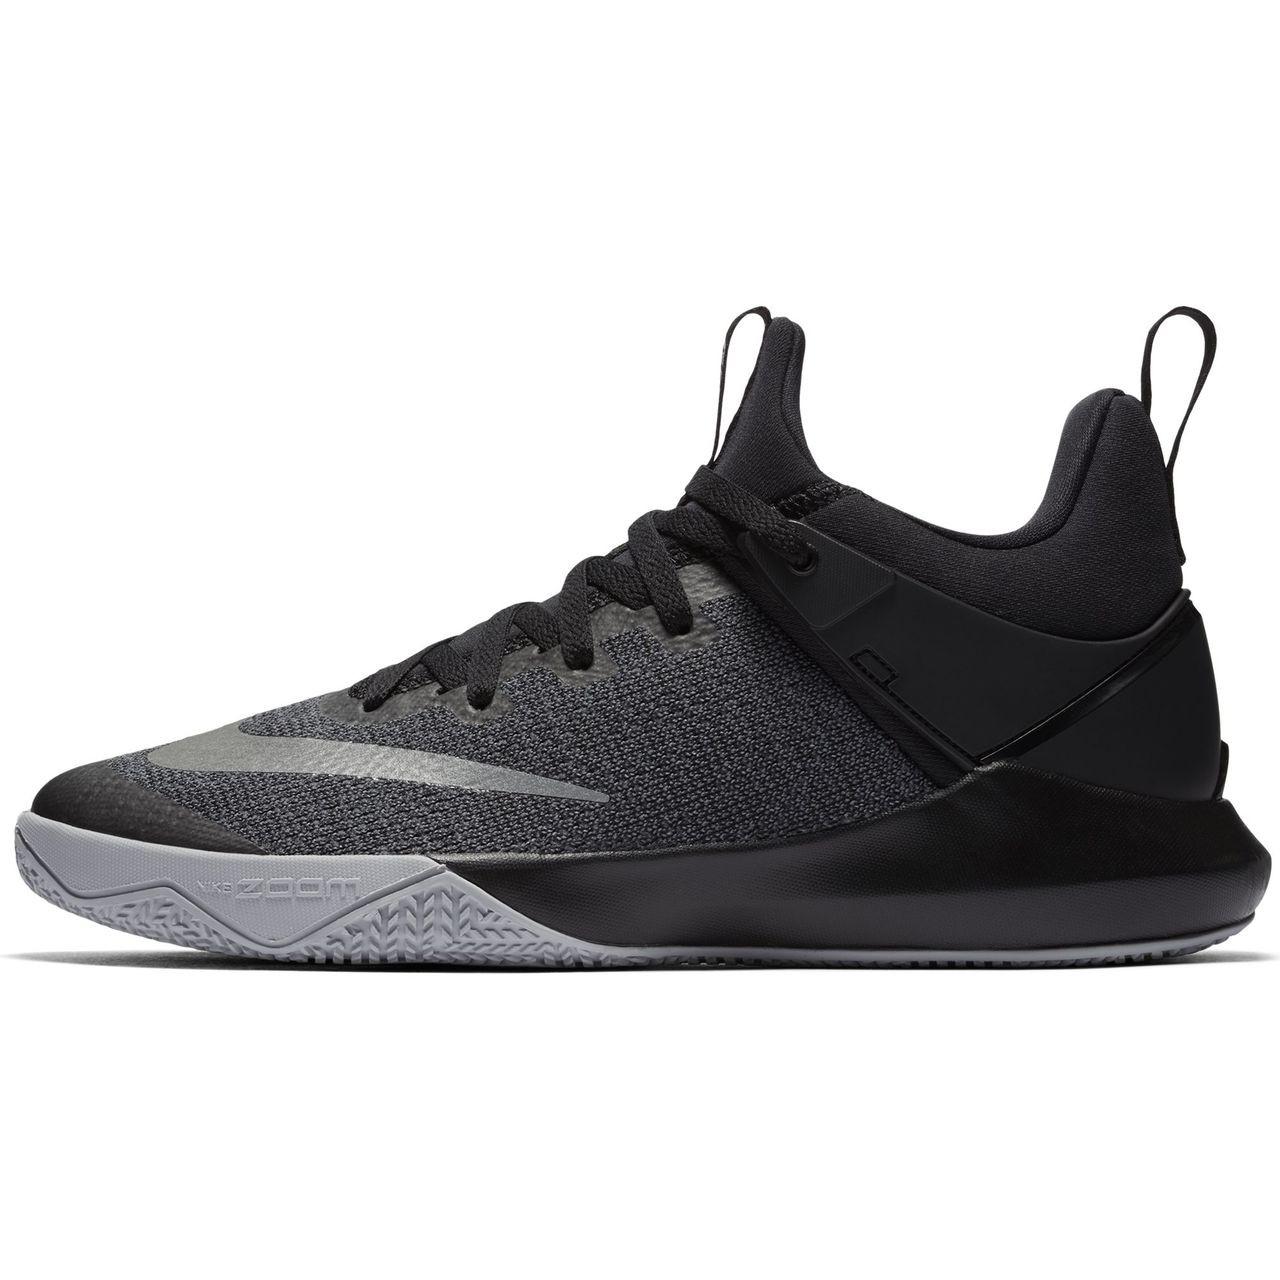 usa cheap sale best hot sales Nike Men's Zoom Shift TB - Black/Grey - Athlete Performance ...